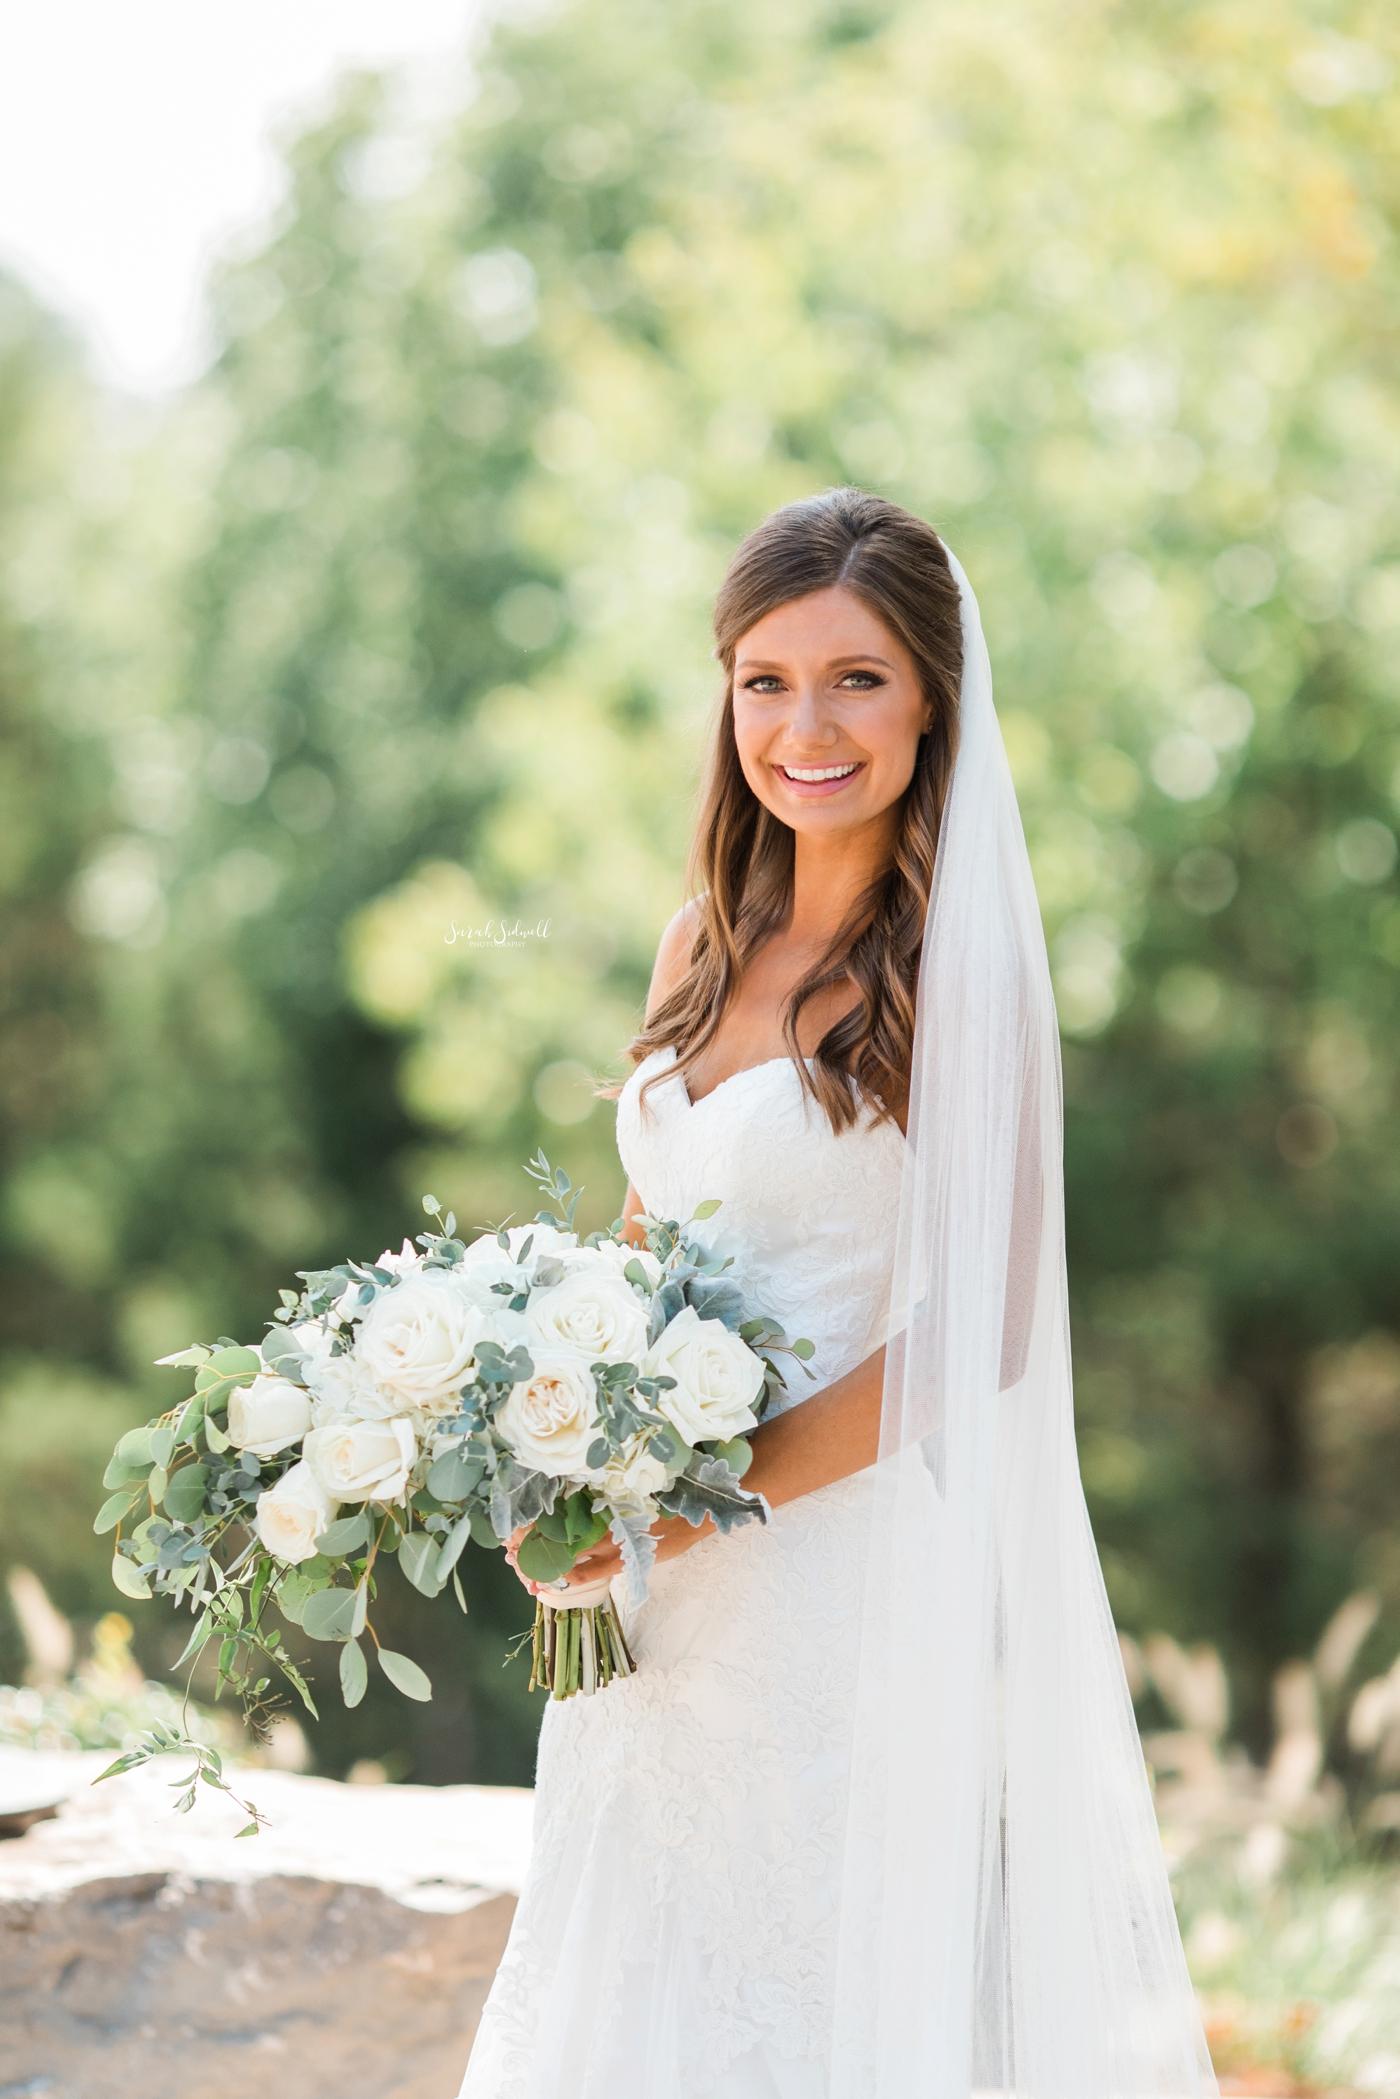 Nashville Wedding Photography   Sarah Sidwell Photography